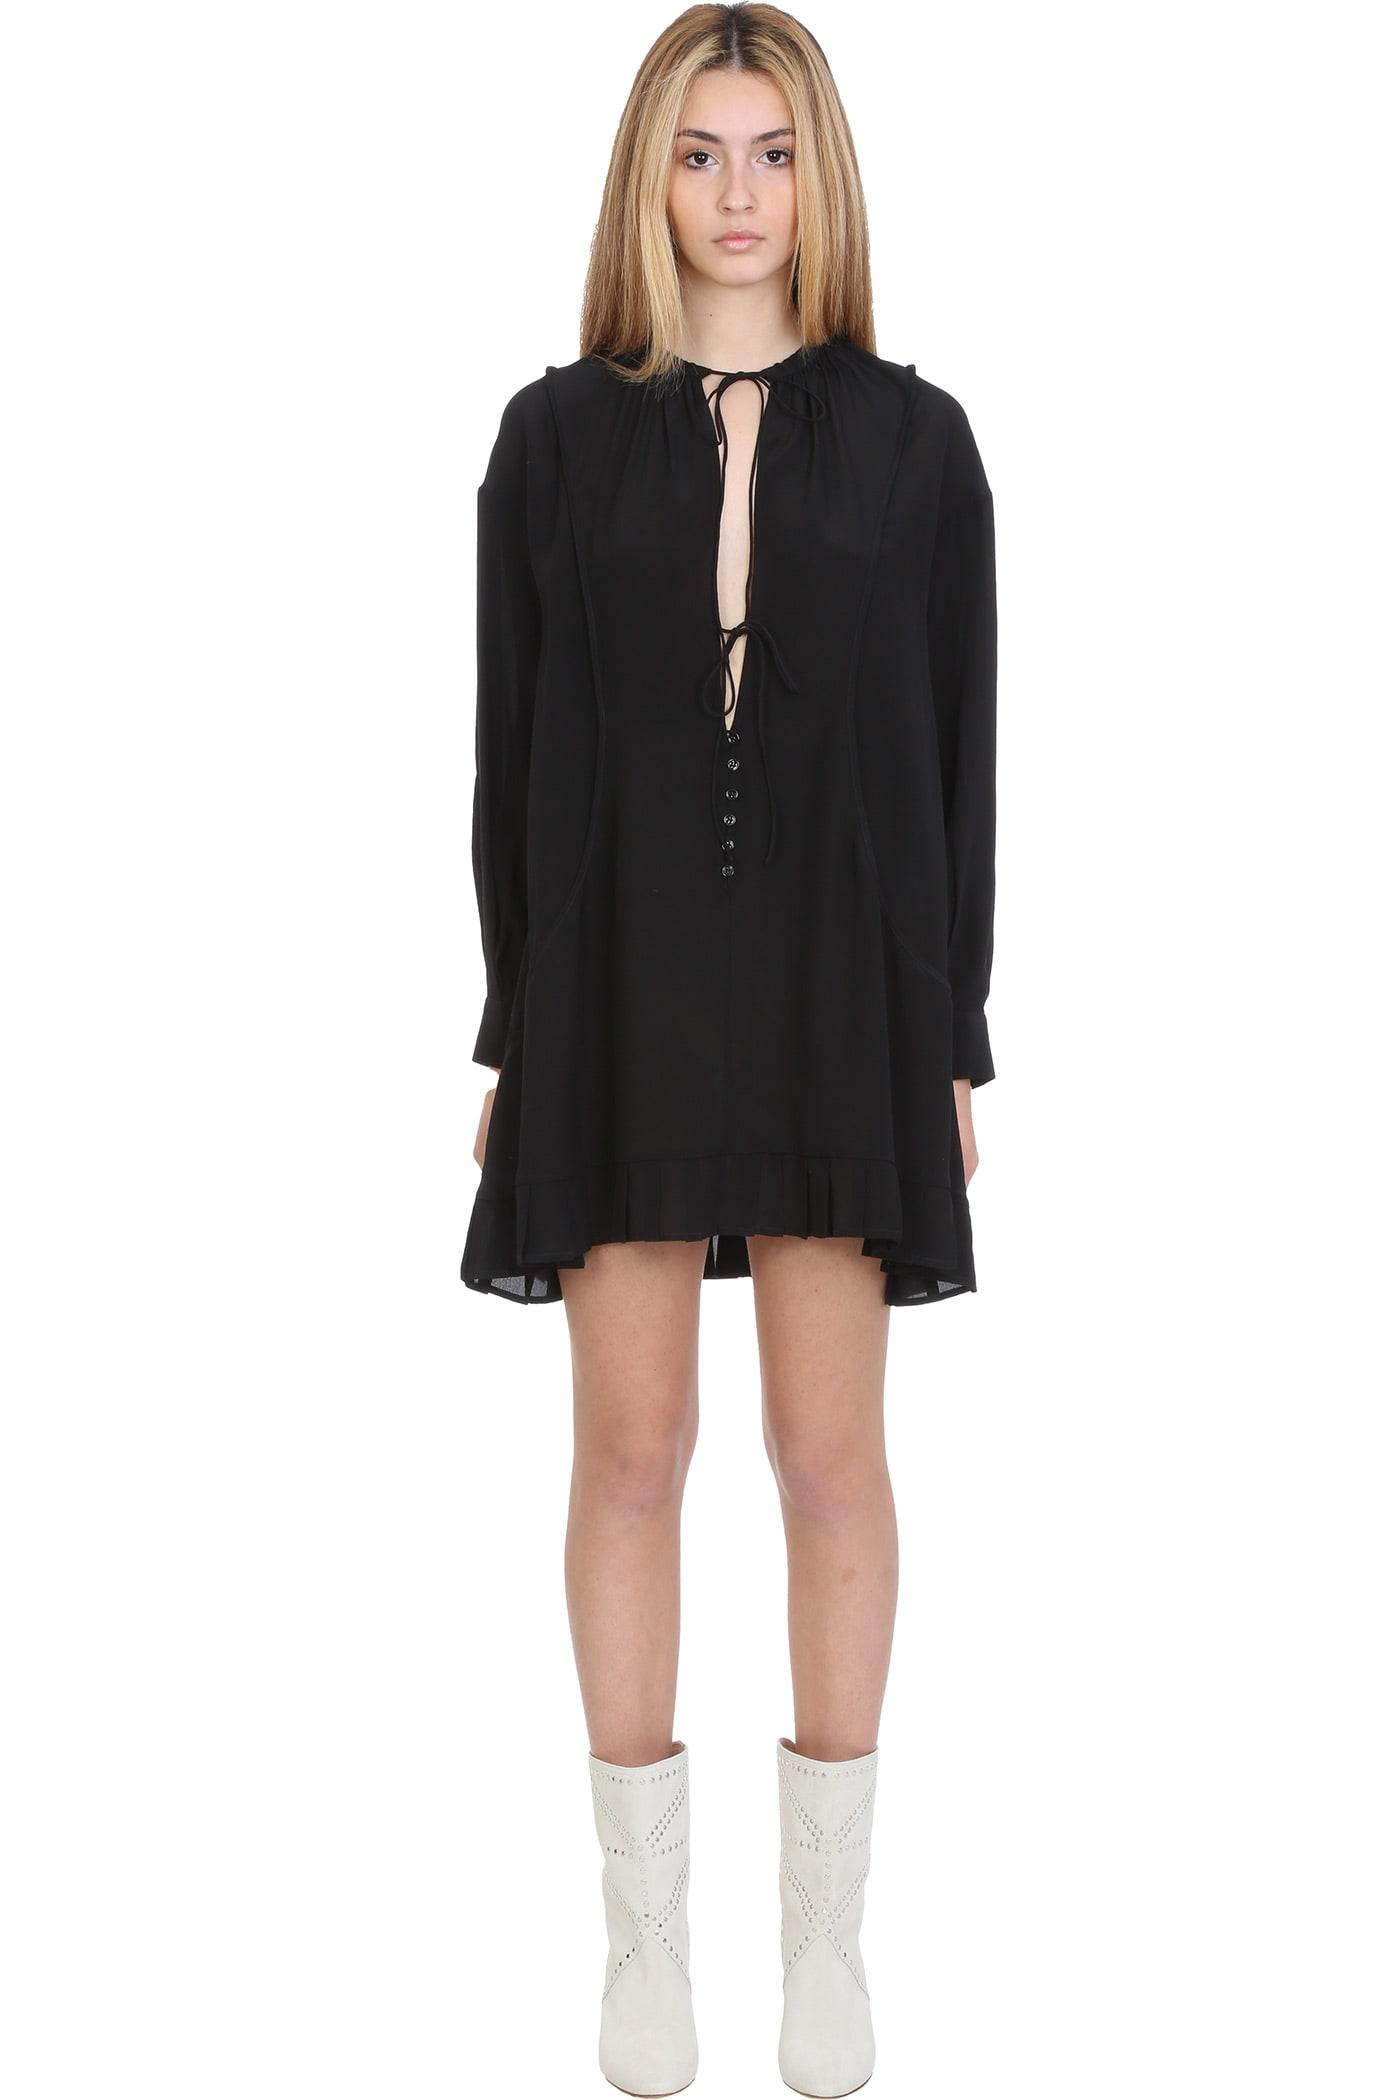 Iro TRONY DRESS IN BLACK SILK